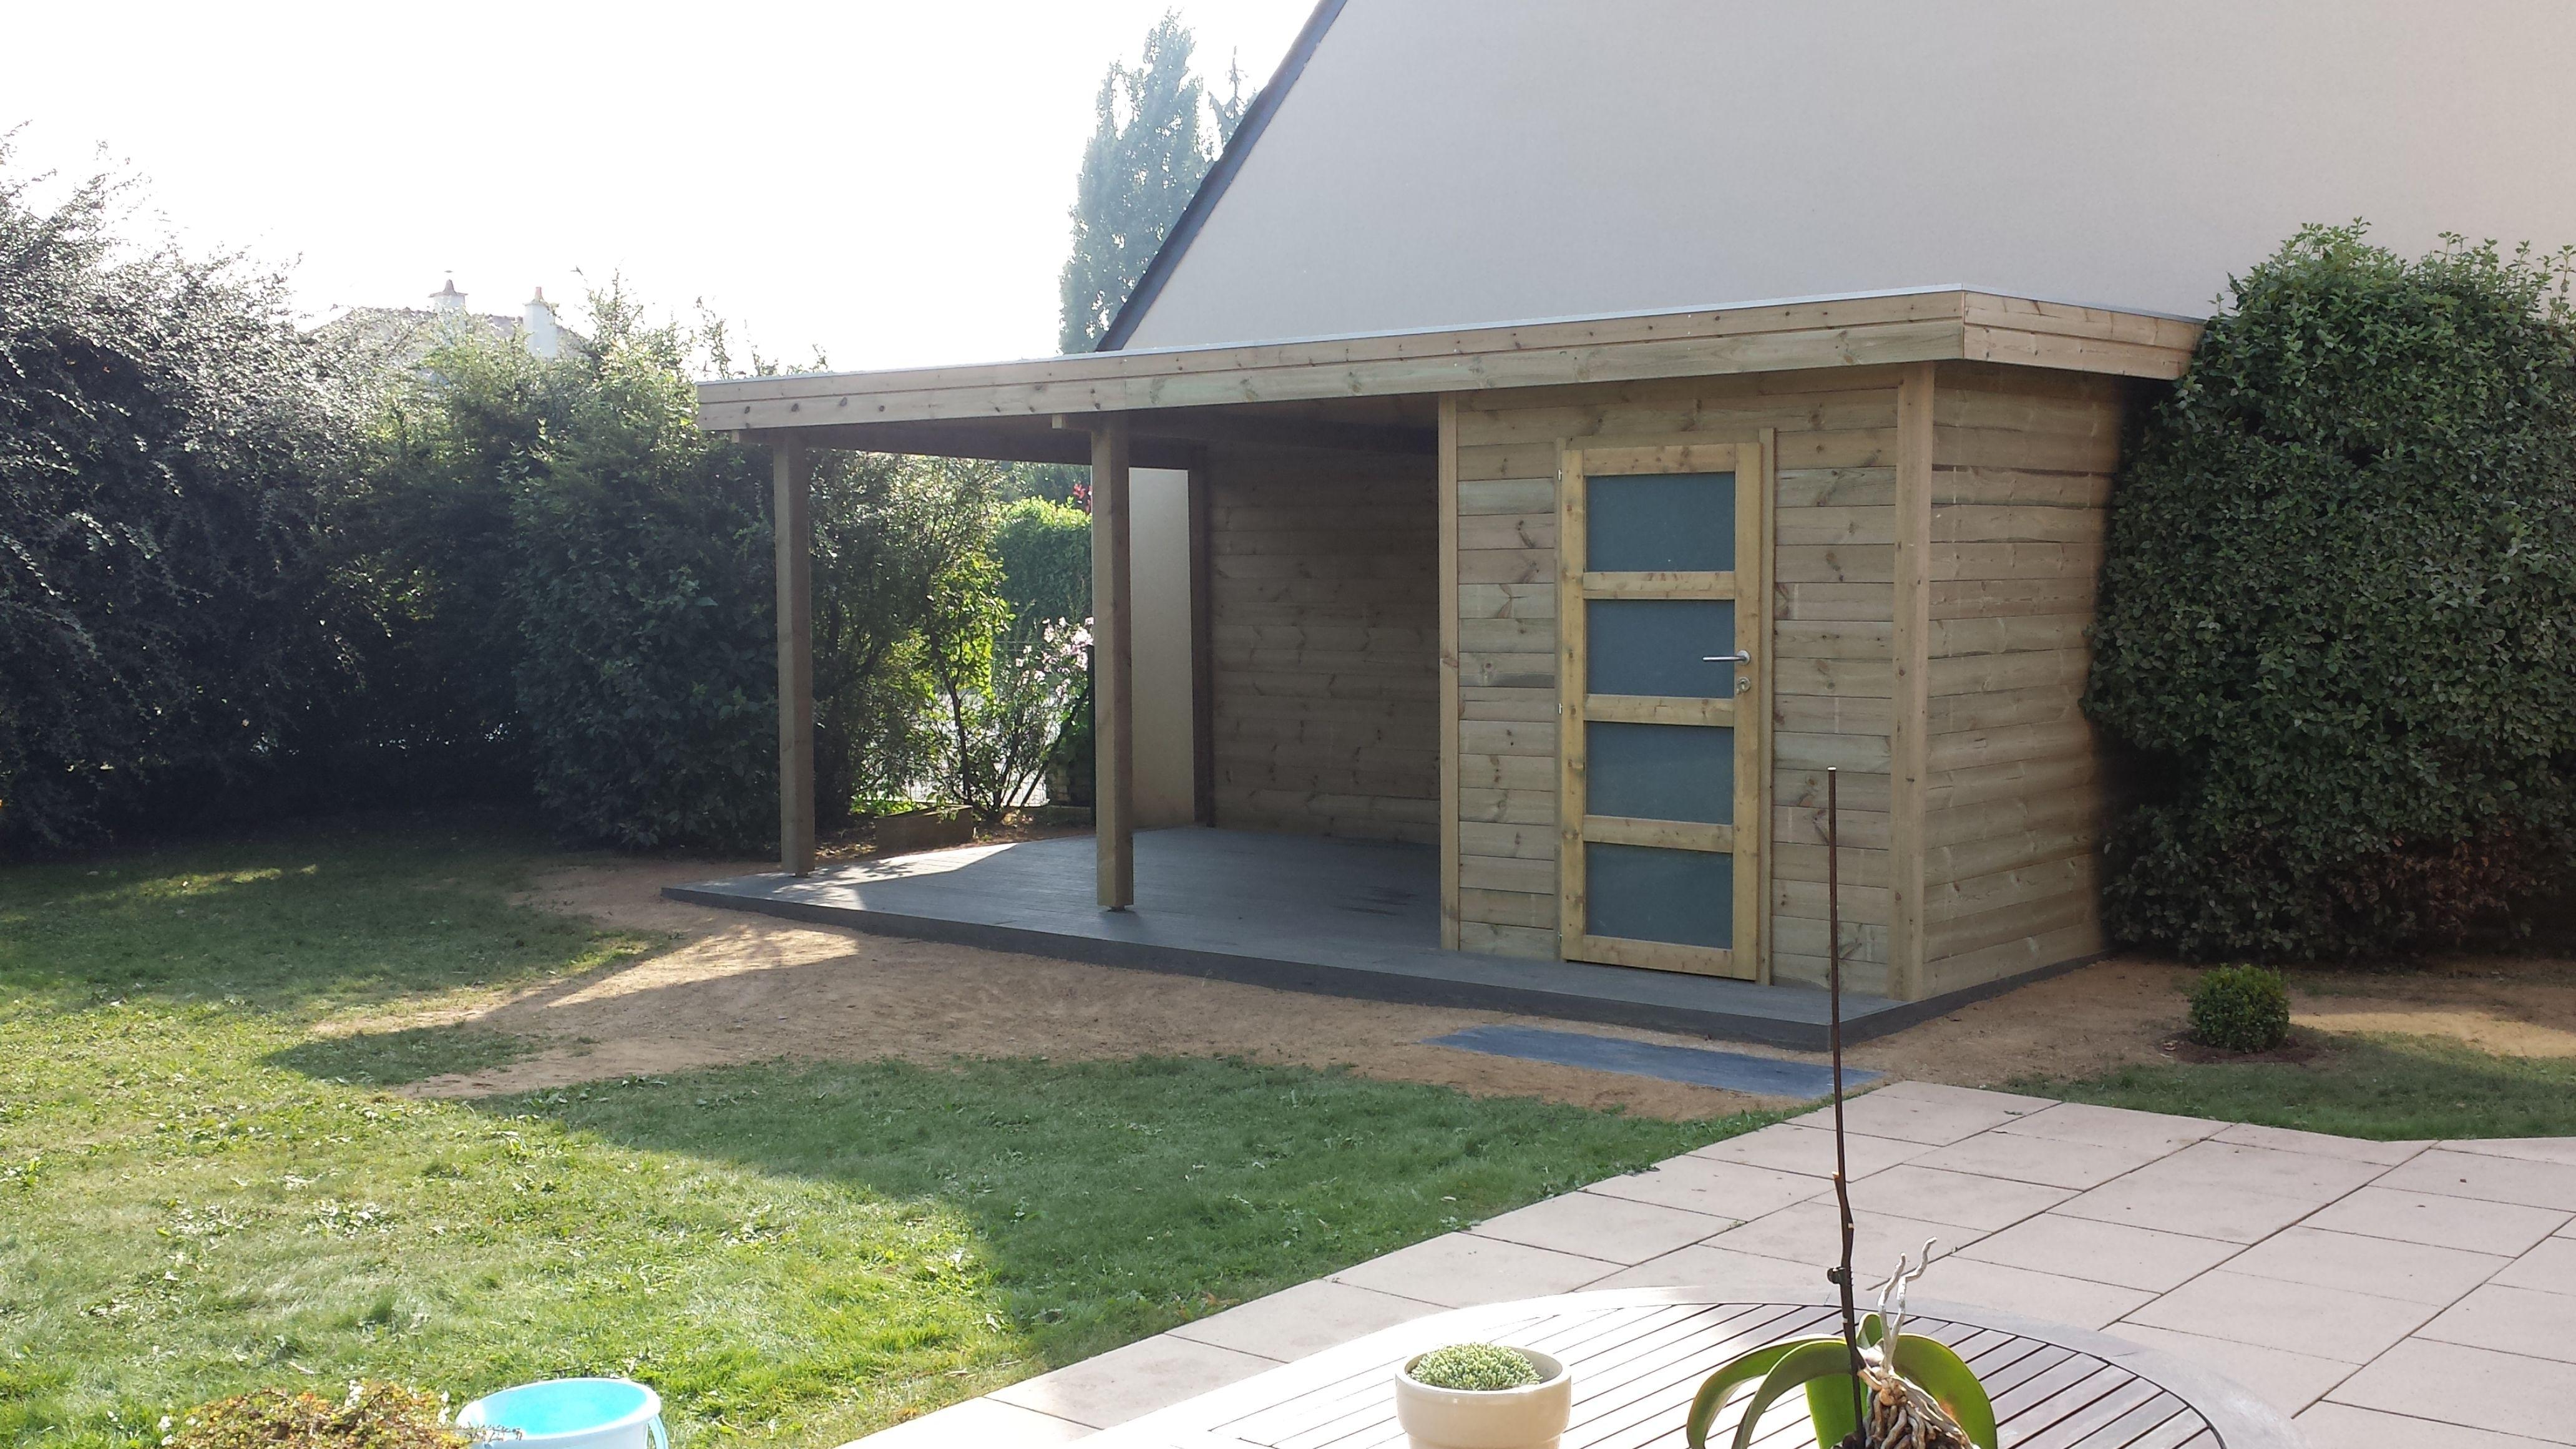 abri de jardin gardival avec extension abris carport. Black Bedroom Furniture Sets. Home Design Ideas